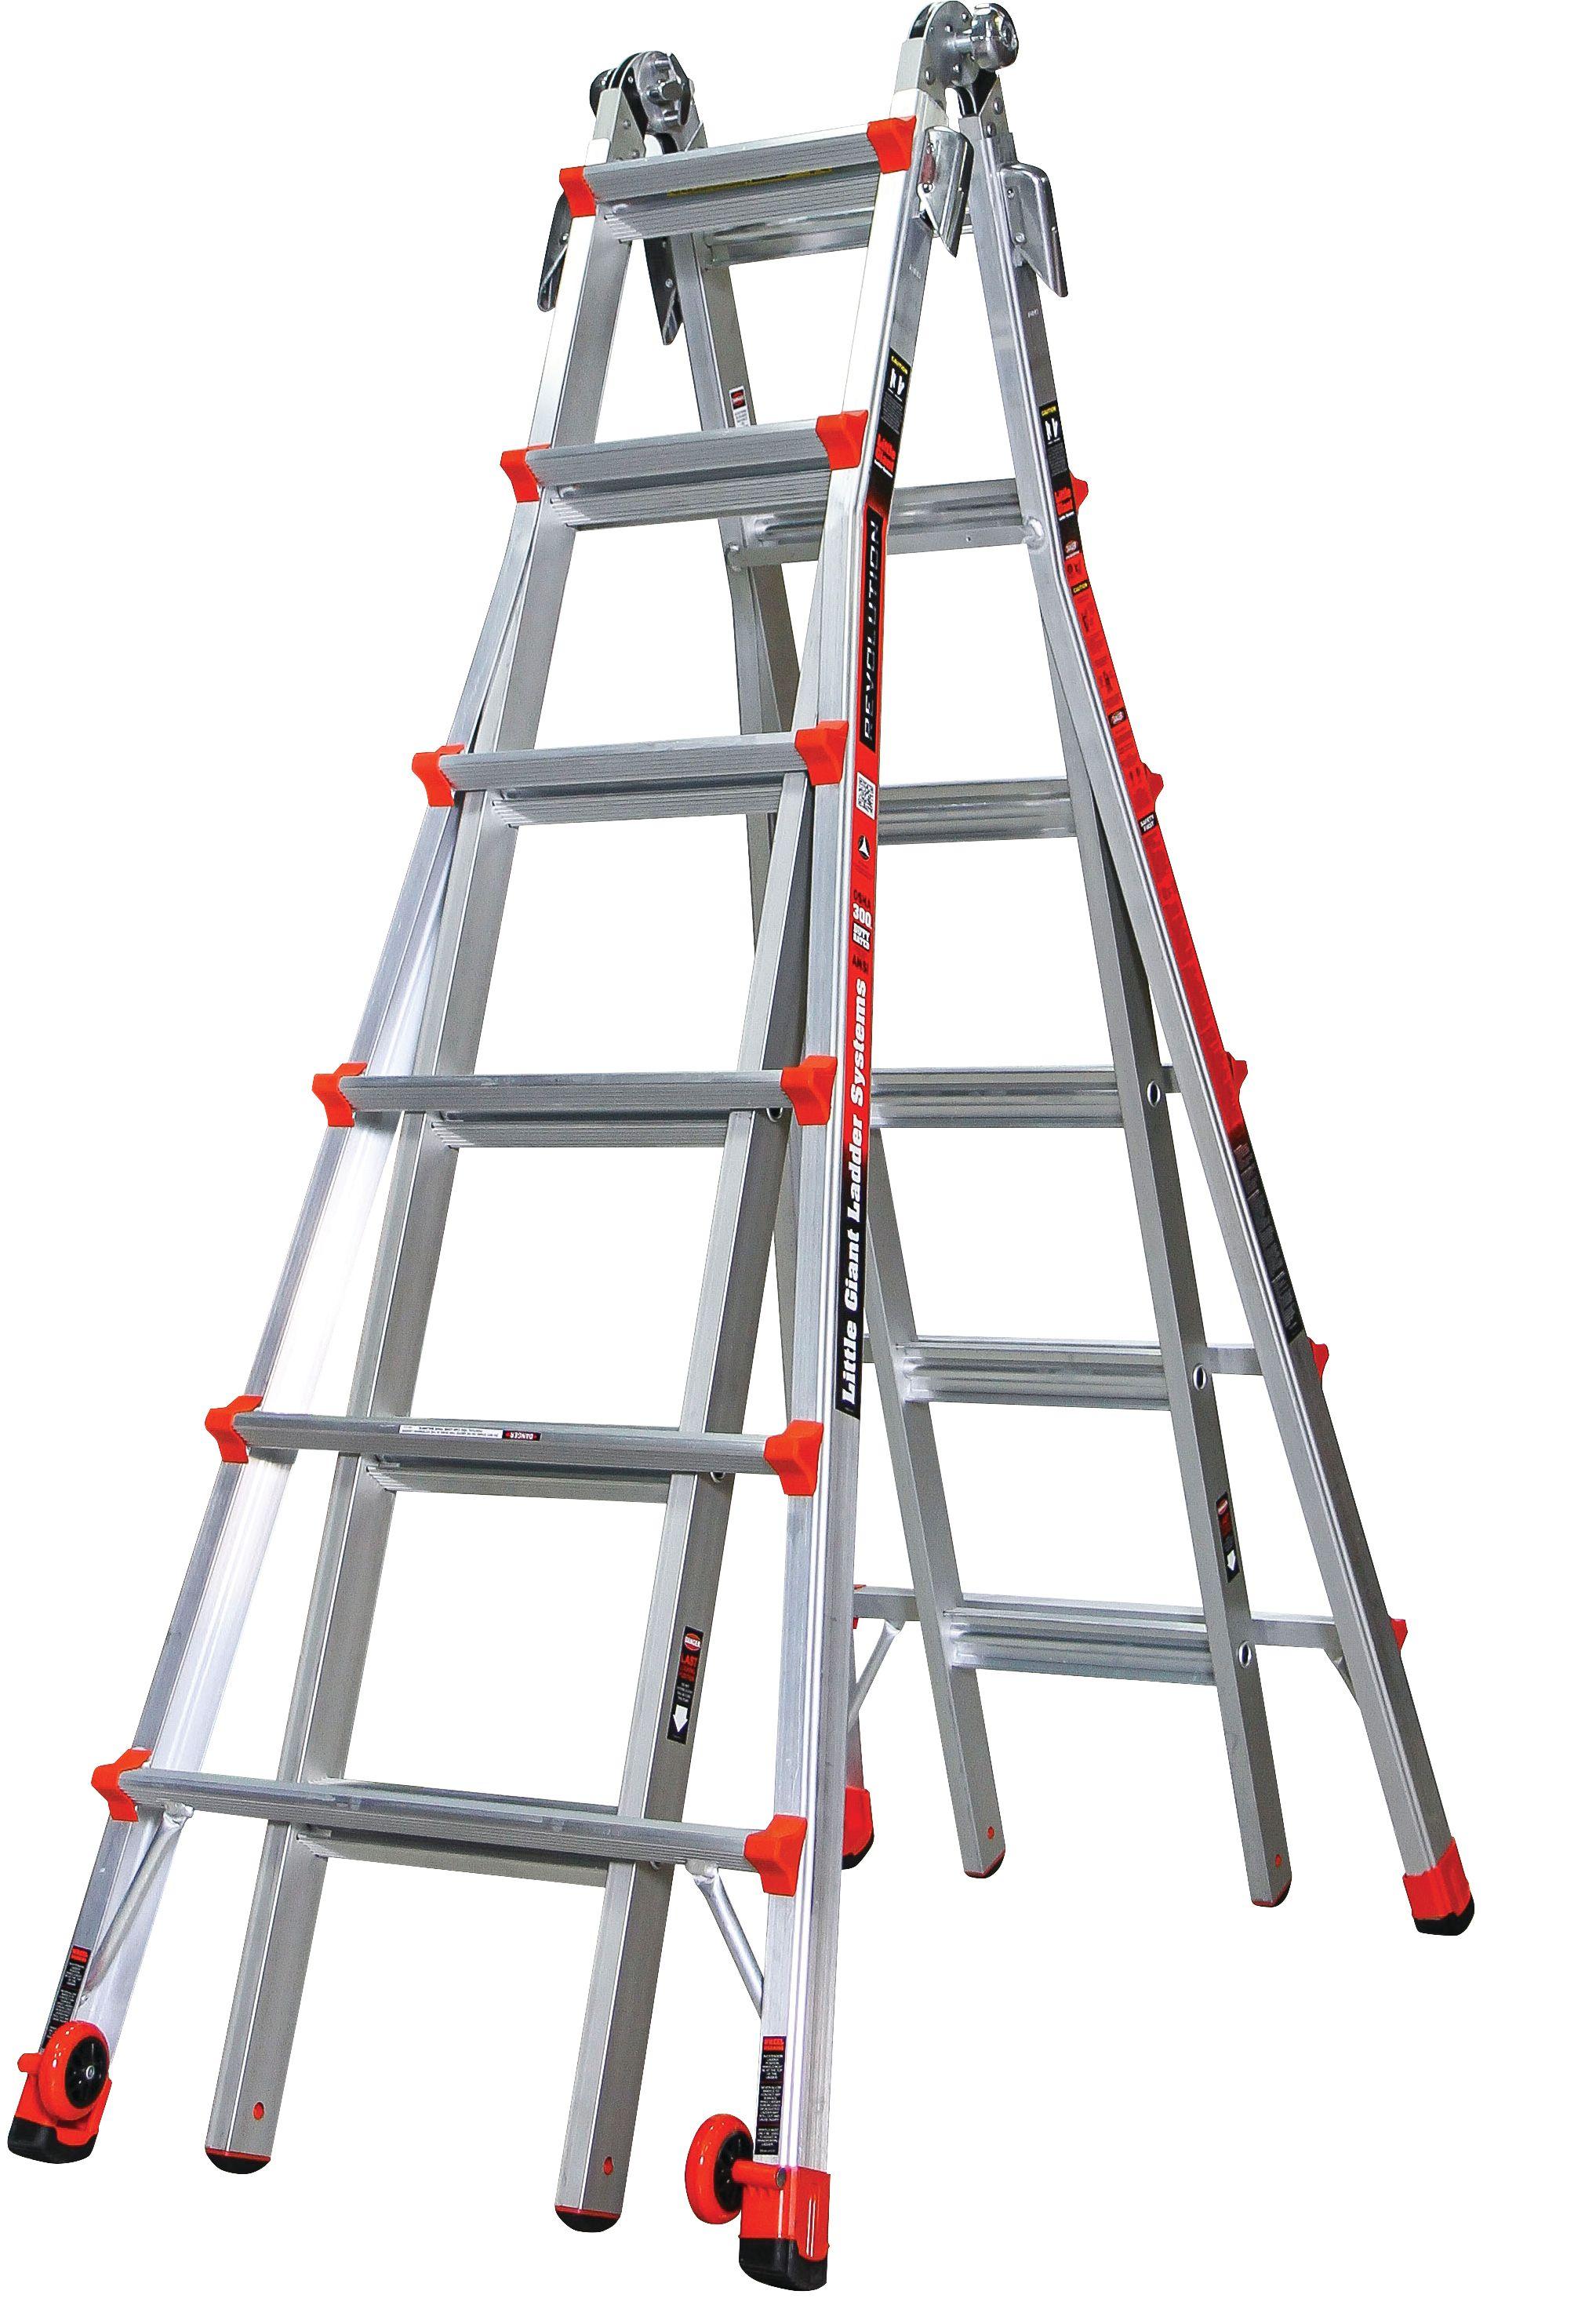 Osha Ladder Storage Dandk Organizer